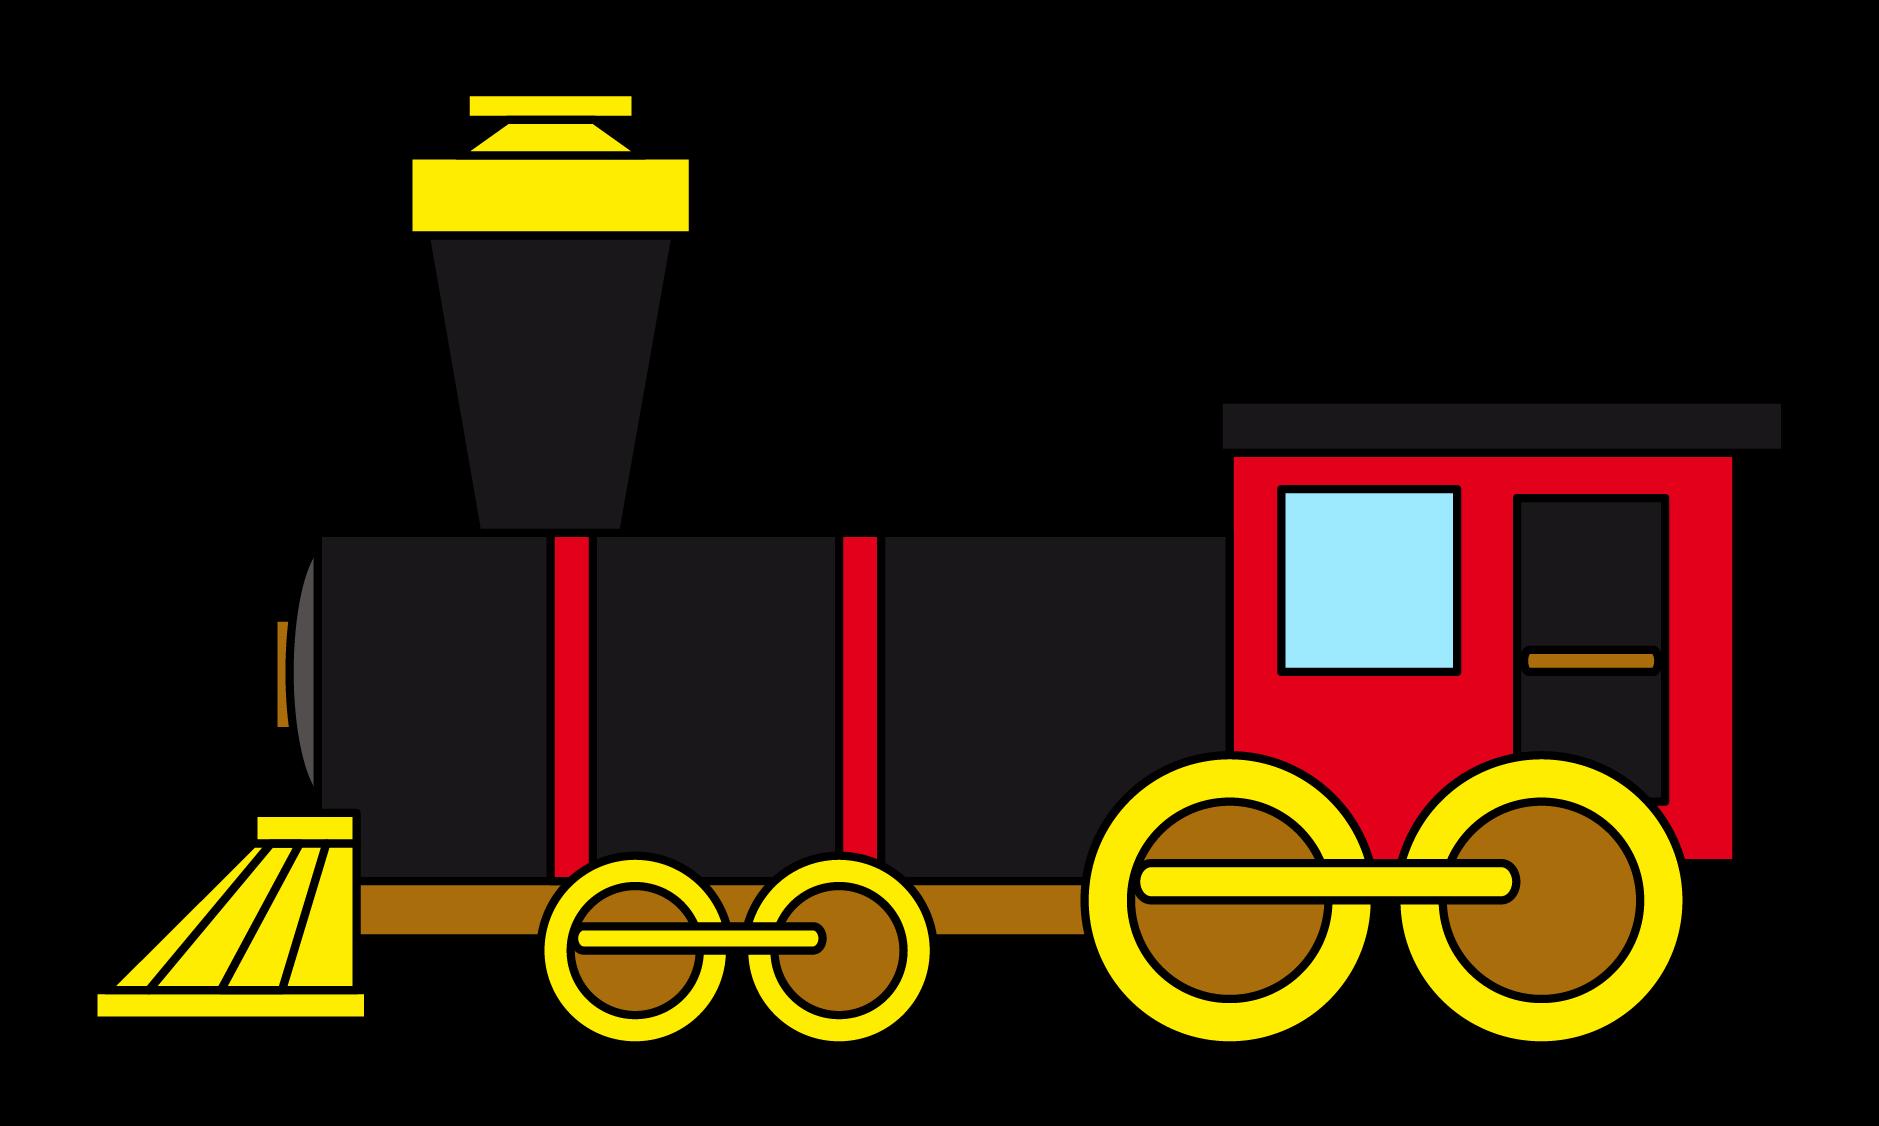 Railways clipart animated train Free Background Cliparts Art Train